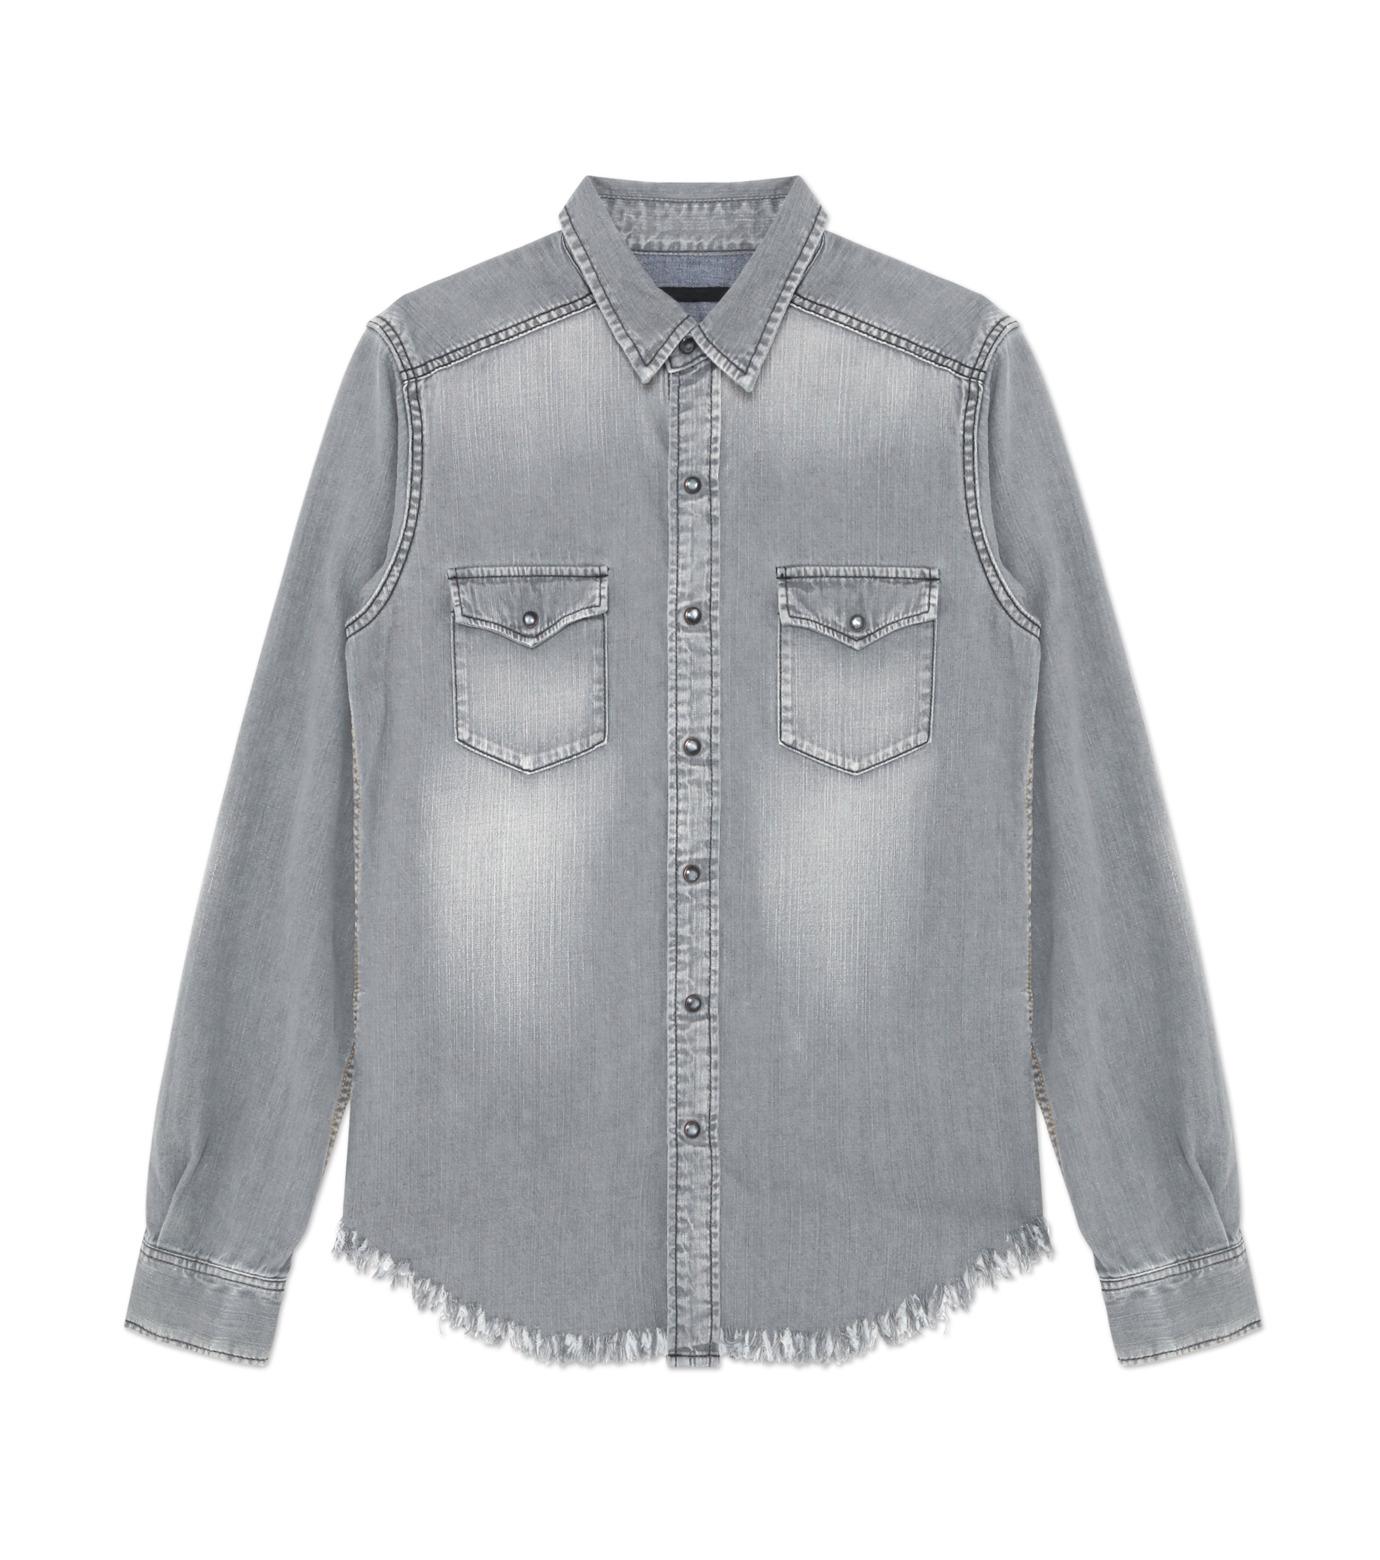 HL HEDDIE LOVU(エイチエル・エディールーヴ)のBK DENIM WASH SHIRT-GRAY(シャツ/shirt)-18S93004-11 拡大詳細画像1